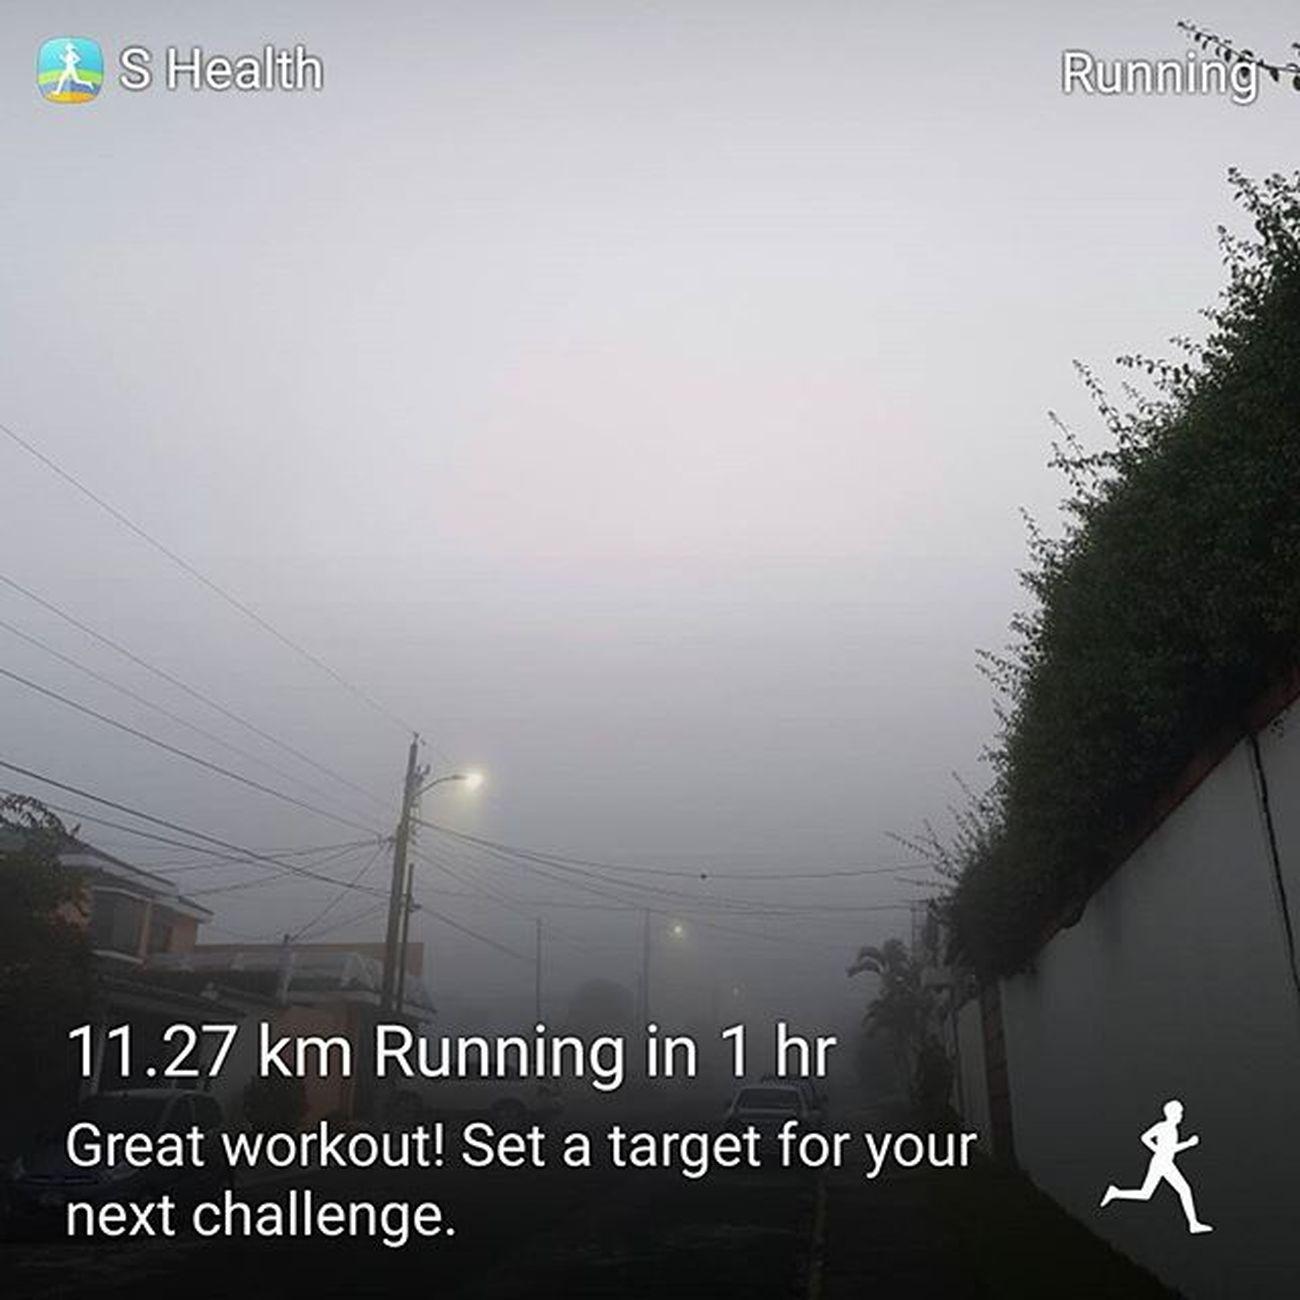 6430Art 6430Life  Guatemala 瓜地馬拉 Shealth Gears Running 跑步 Correr Feliz Happy 快樂 11.27 Kms 公里